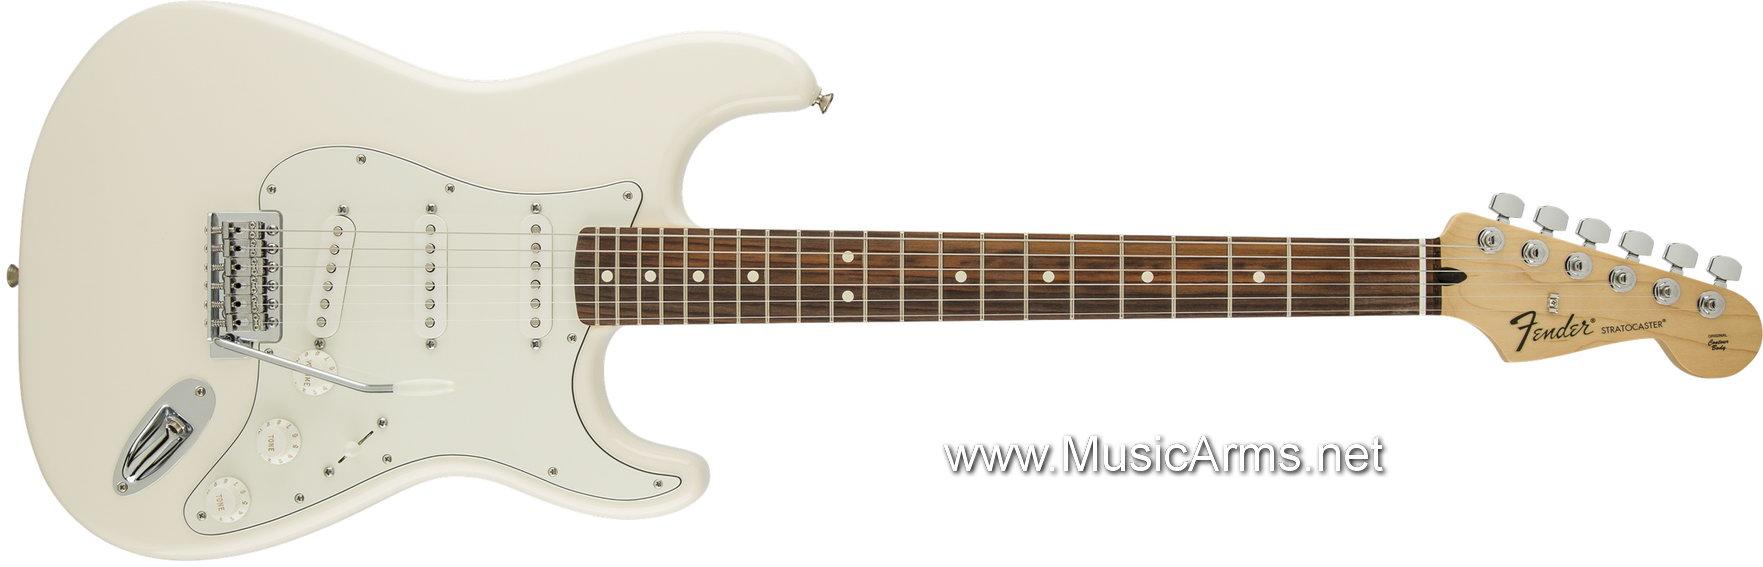 standard strat-RW Arctic White ขายราคาพิเศษ